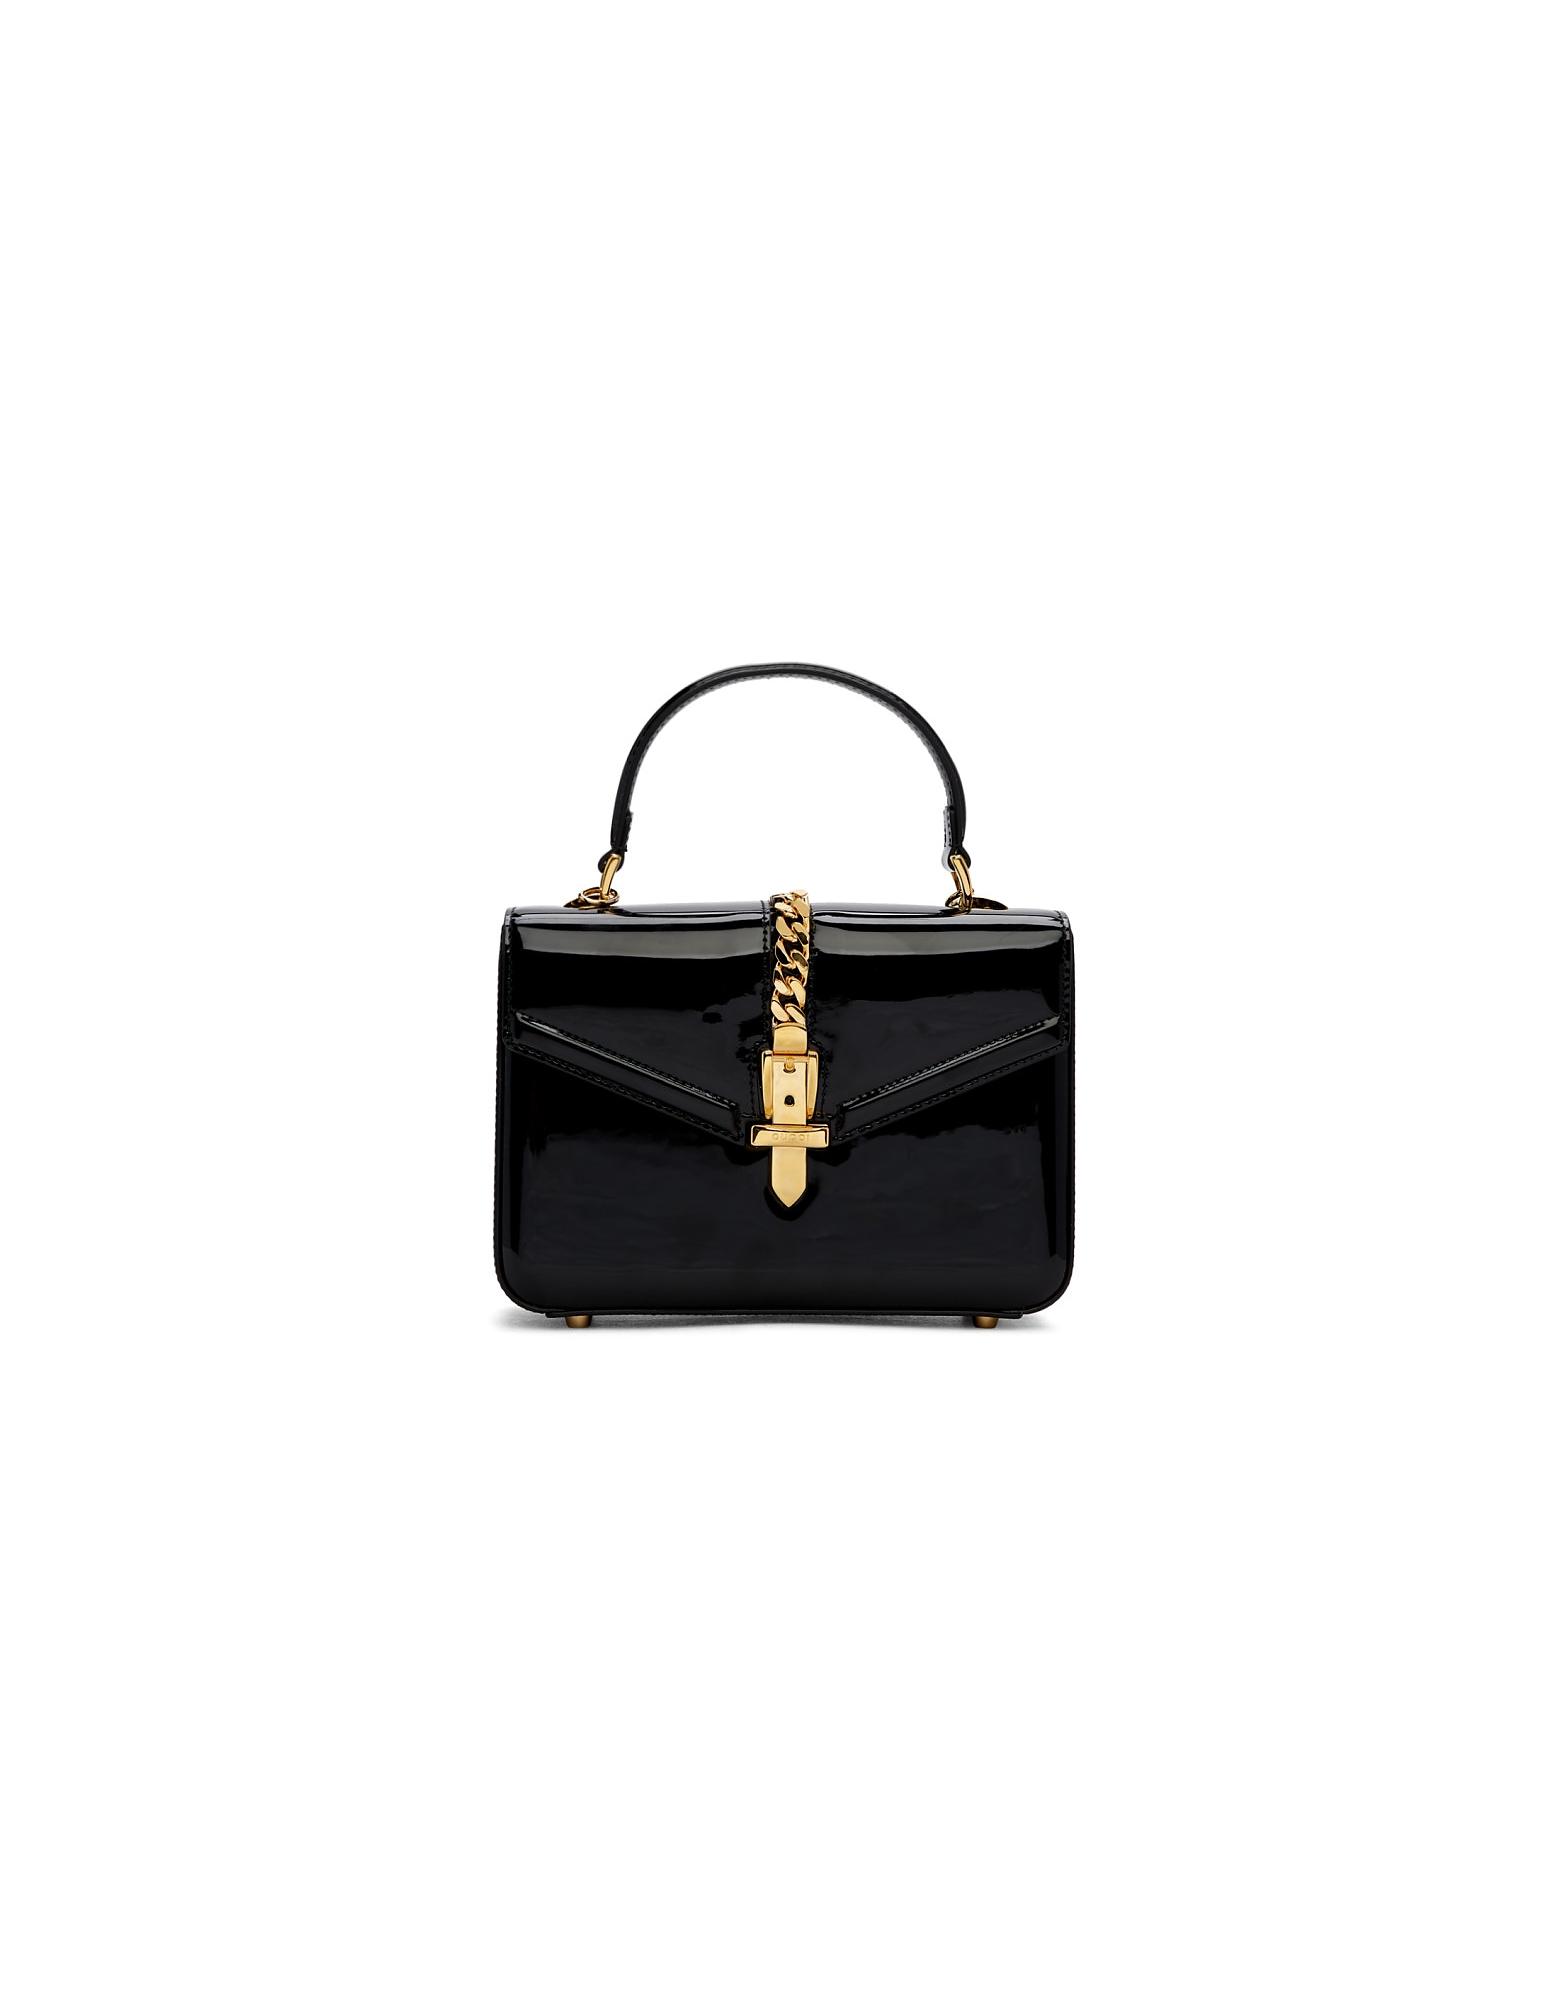 Gucci Designer Handbags, Black Mini Patent Sylvie Bag